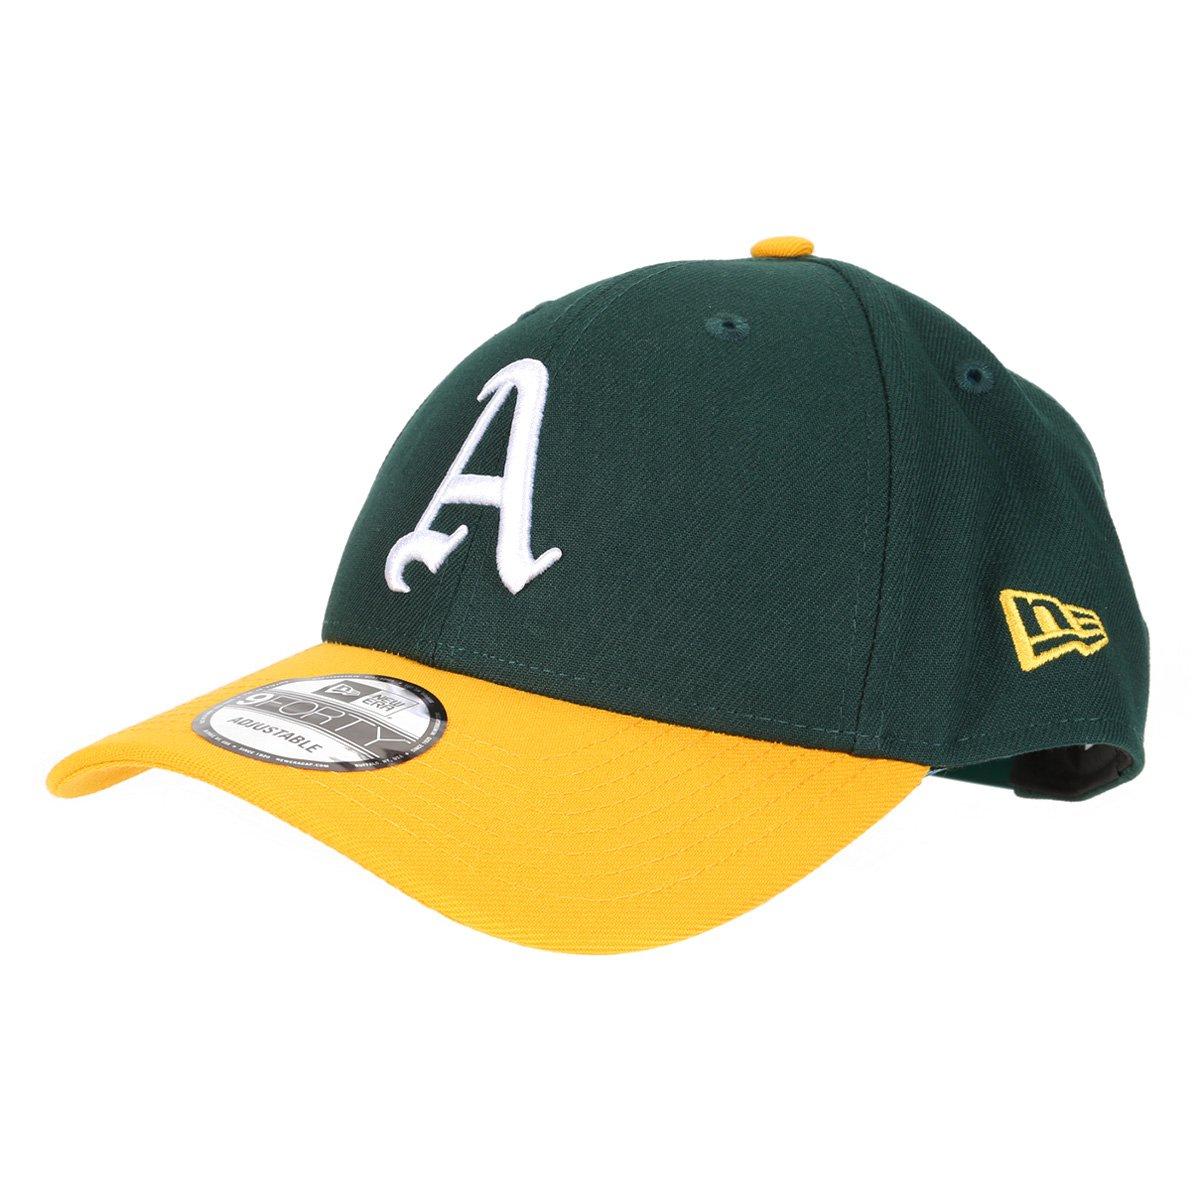 Boné New Era MLB Oakland Athletics Aba Curva Snapback Team 9Fifty